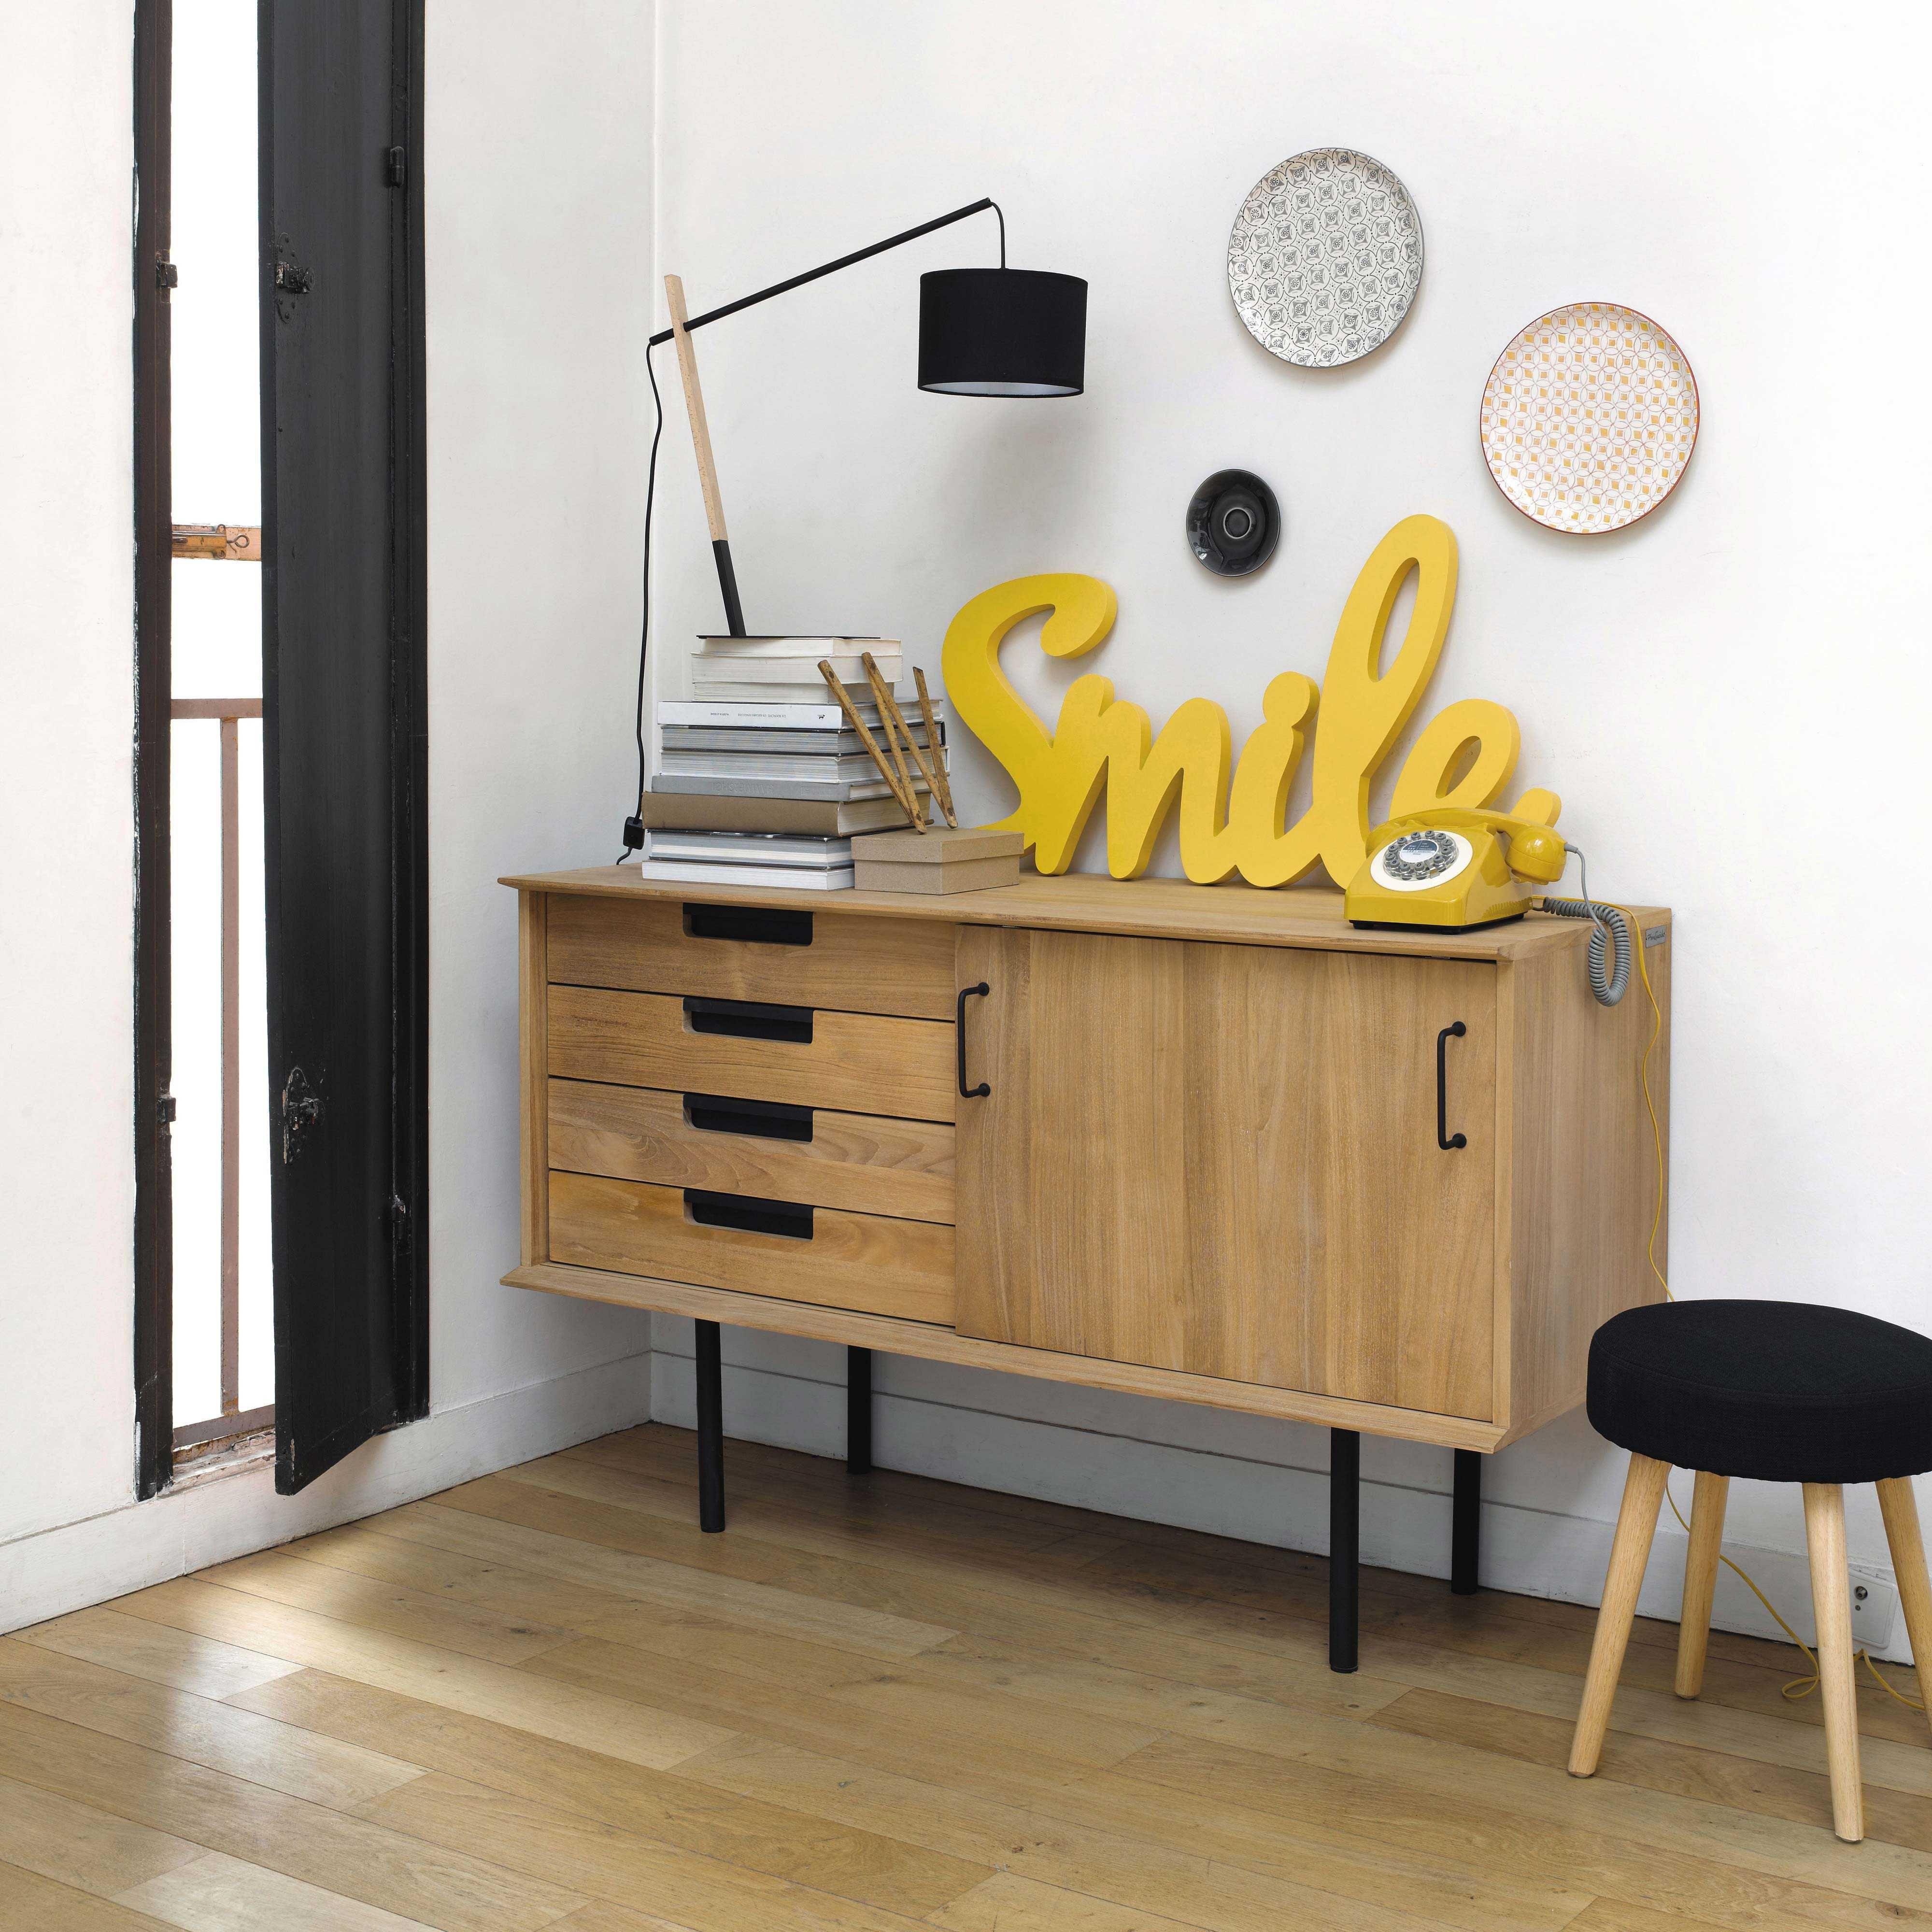 maison du monde buffet guariche ventana blog. Black Bedroom Furniture Sets. Home Design Ideas